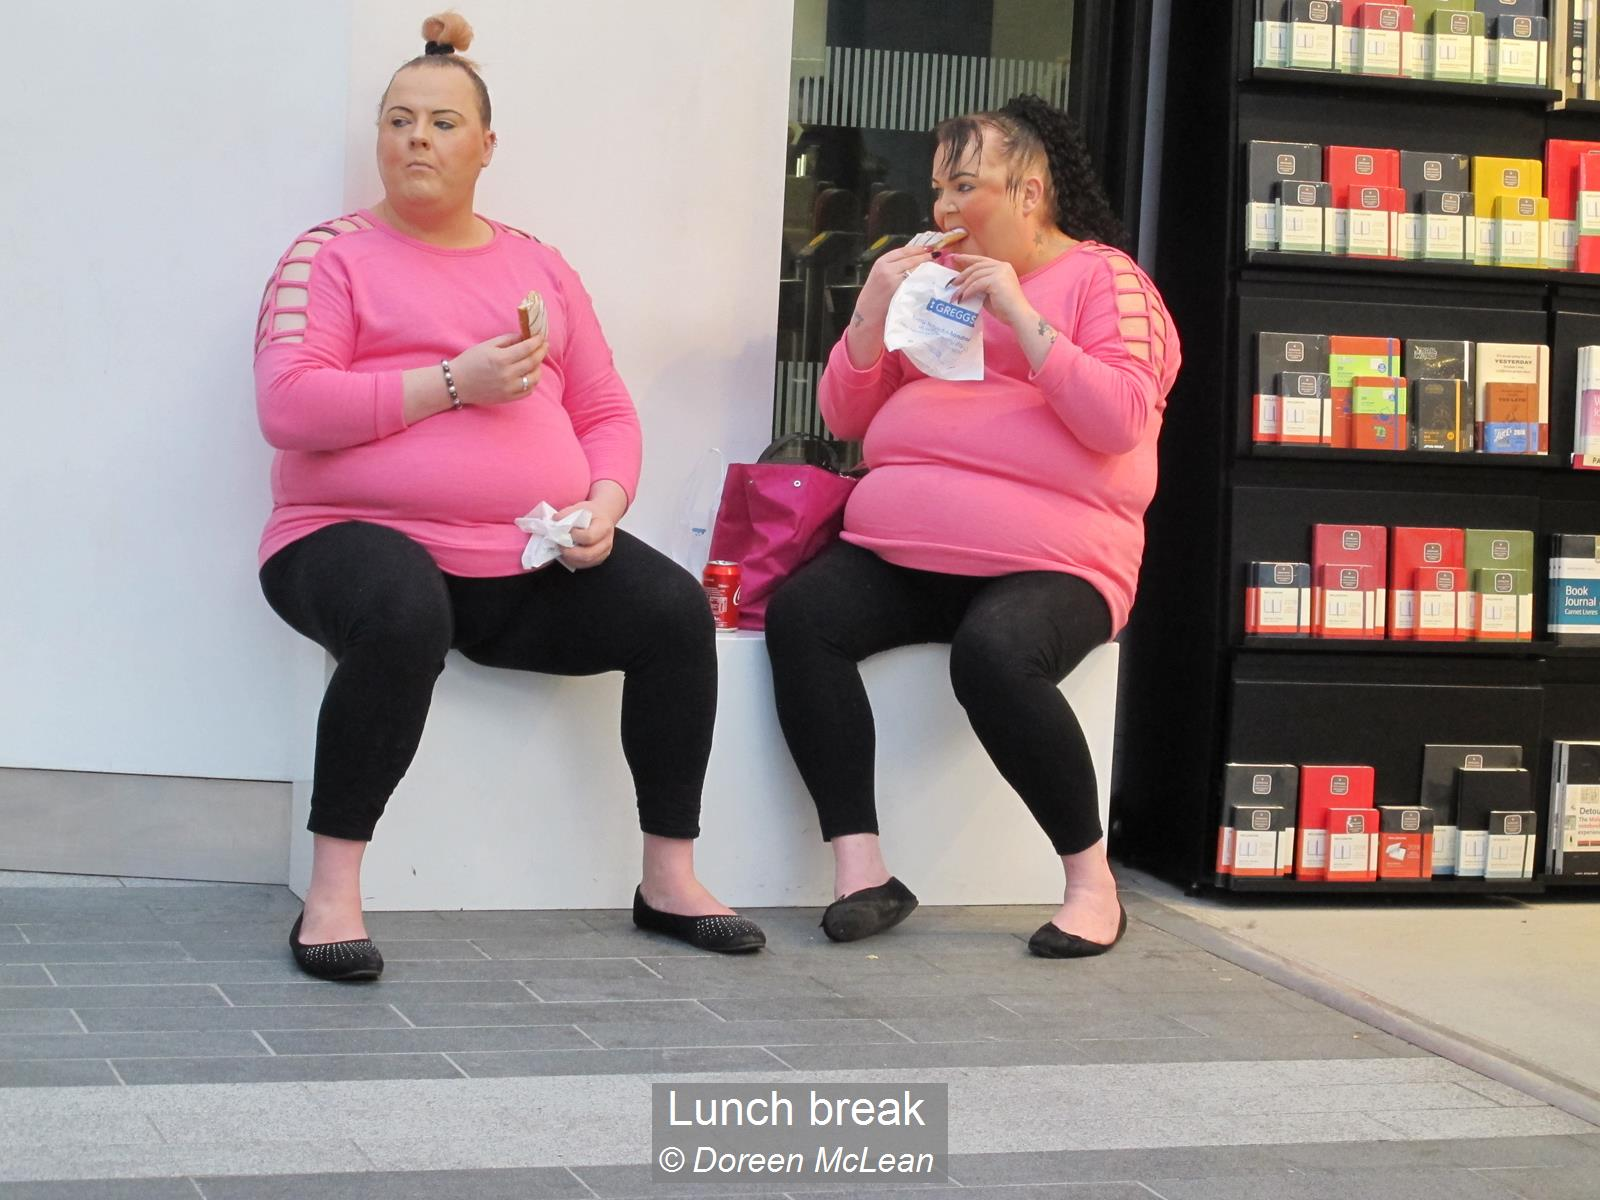 Doreen McLean_Lunch break_None